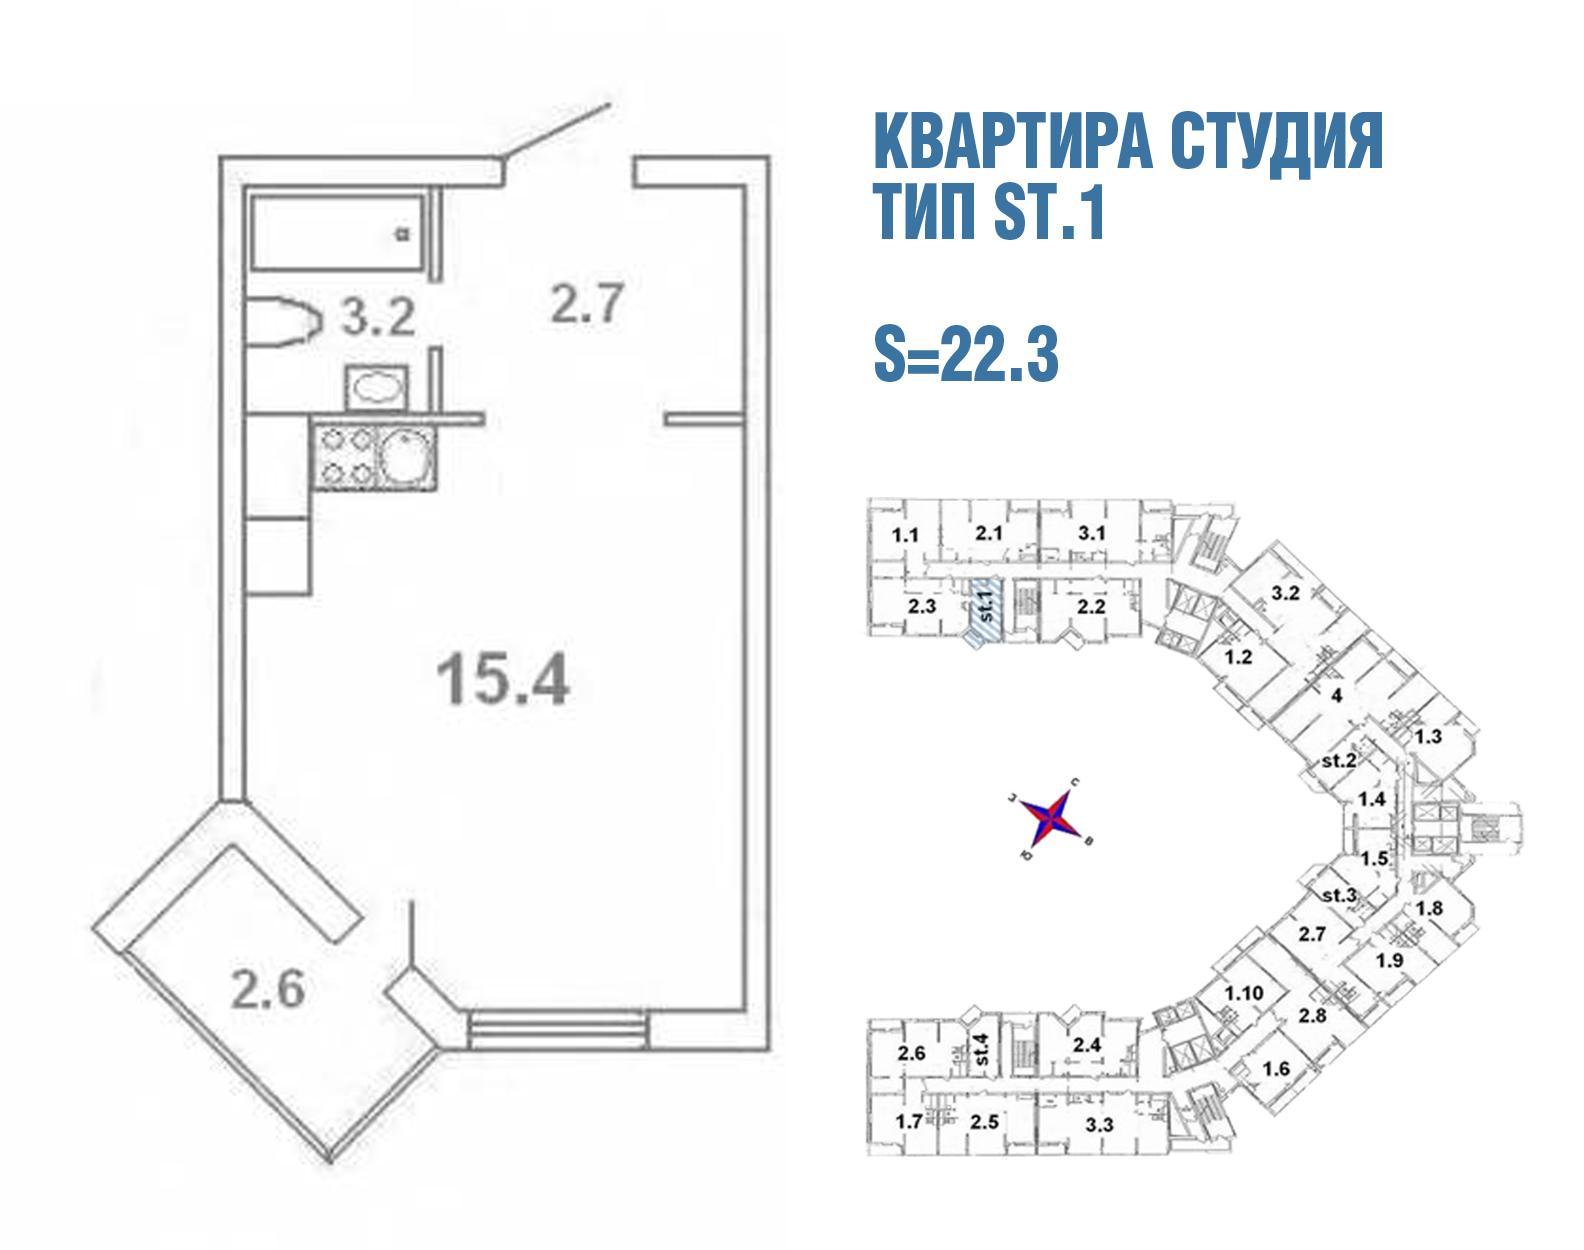 Квартира студия тип st.1 - 21,3 кв.м.